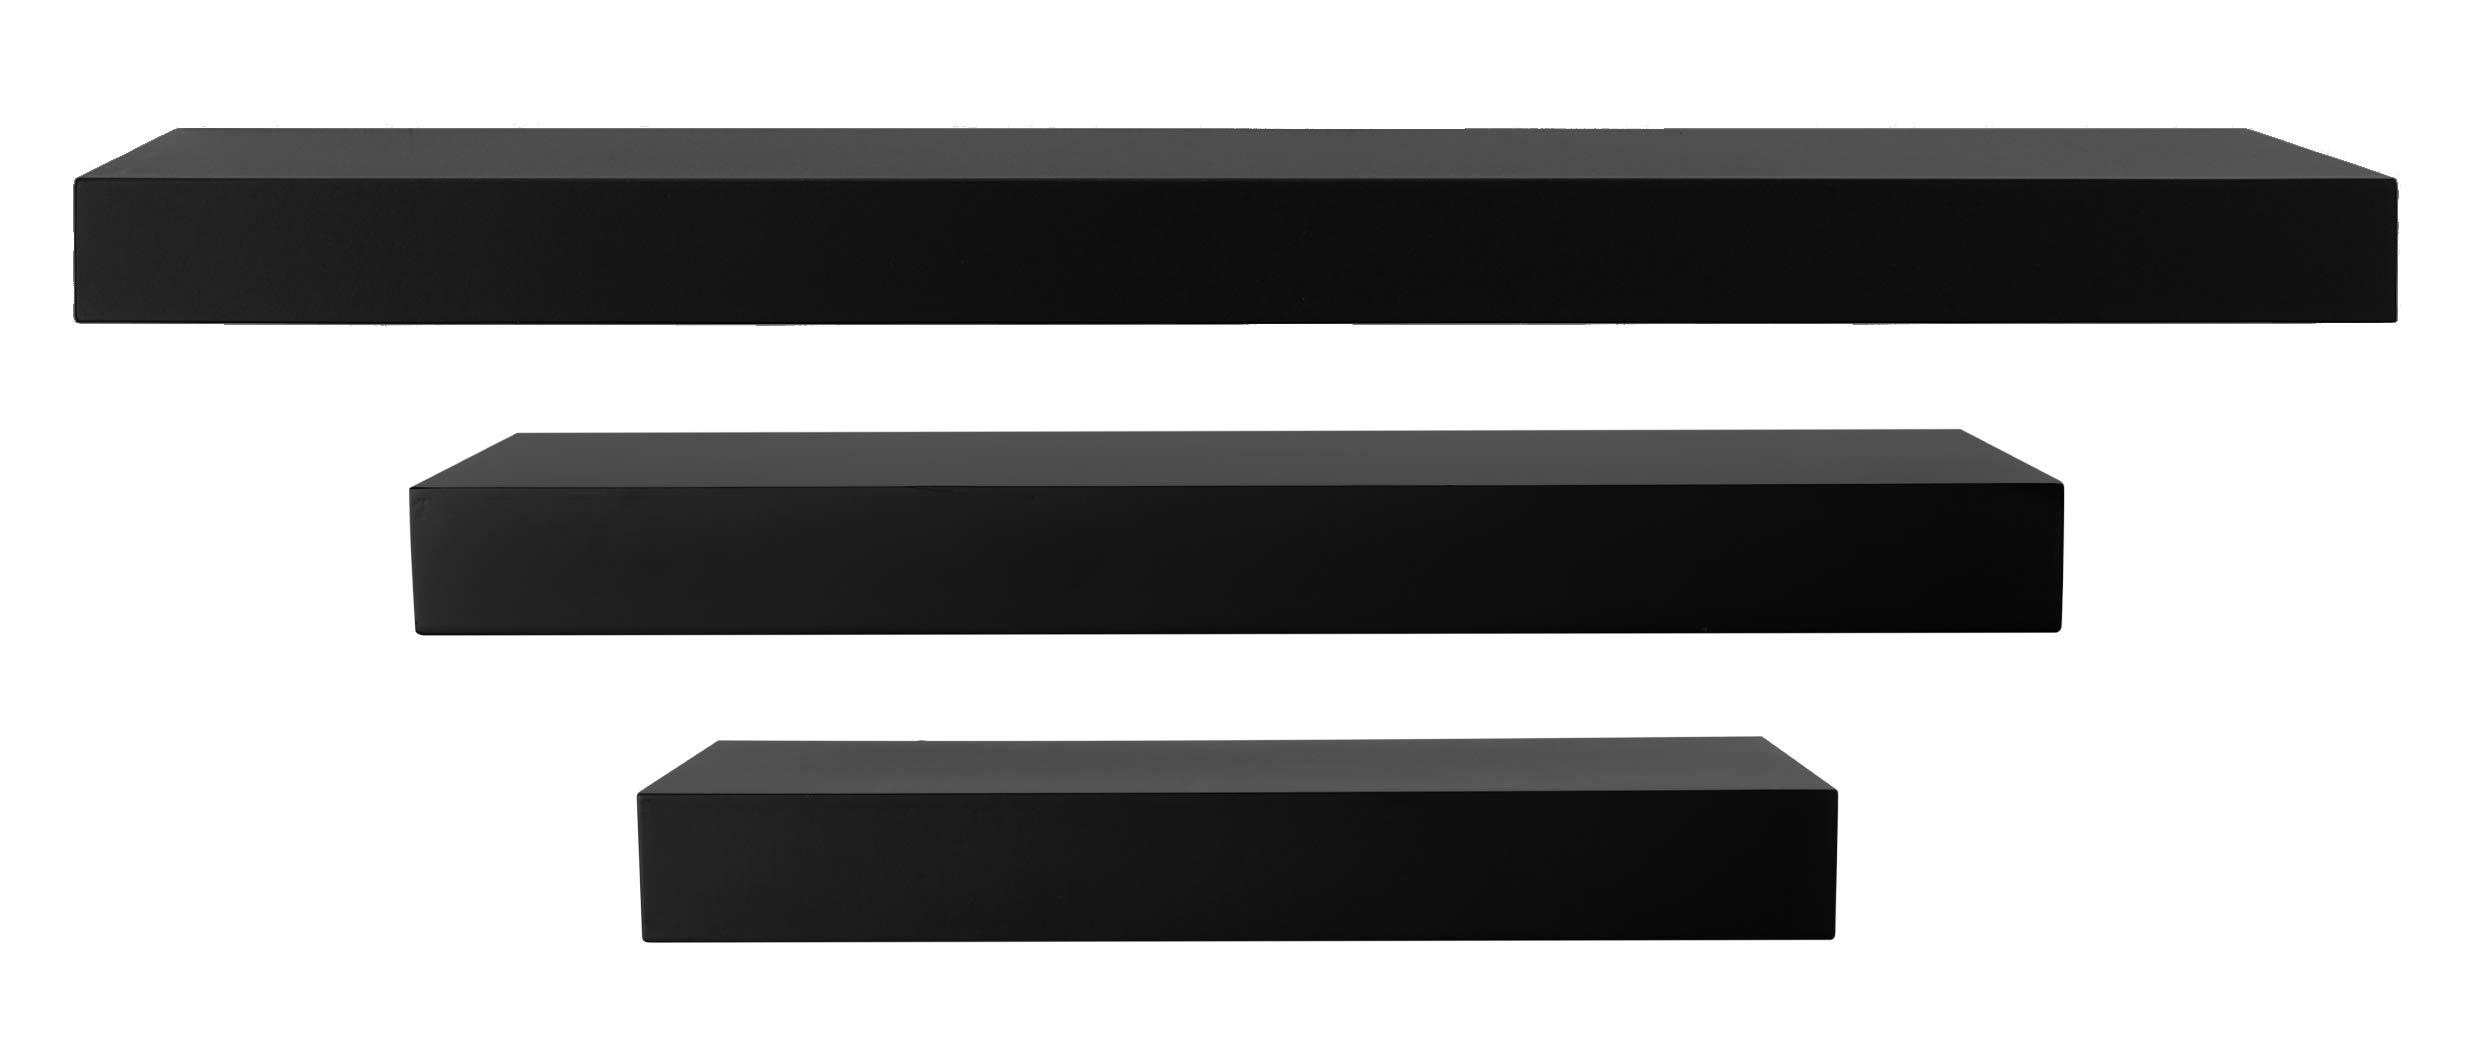 kieragrace FN00372-0 Modern Floating-Shelves, Pack of 3, Black, 3 Count